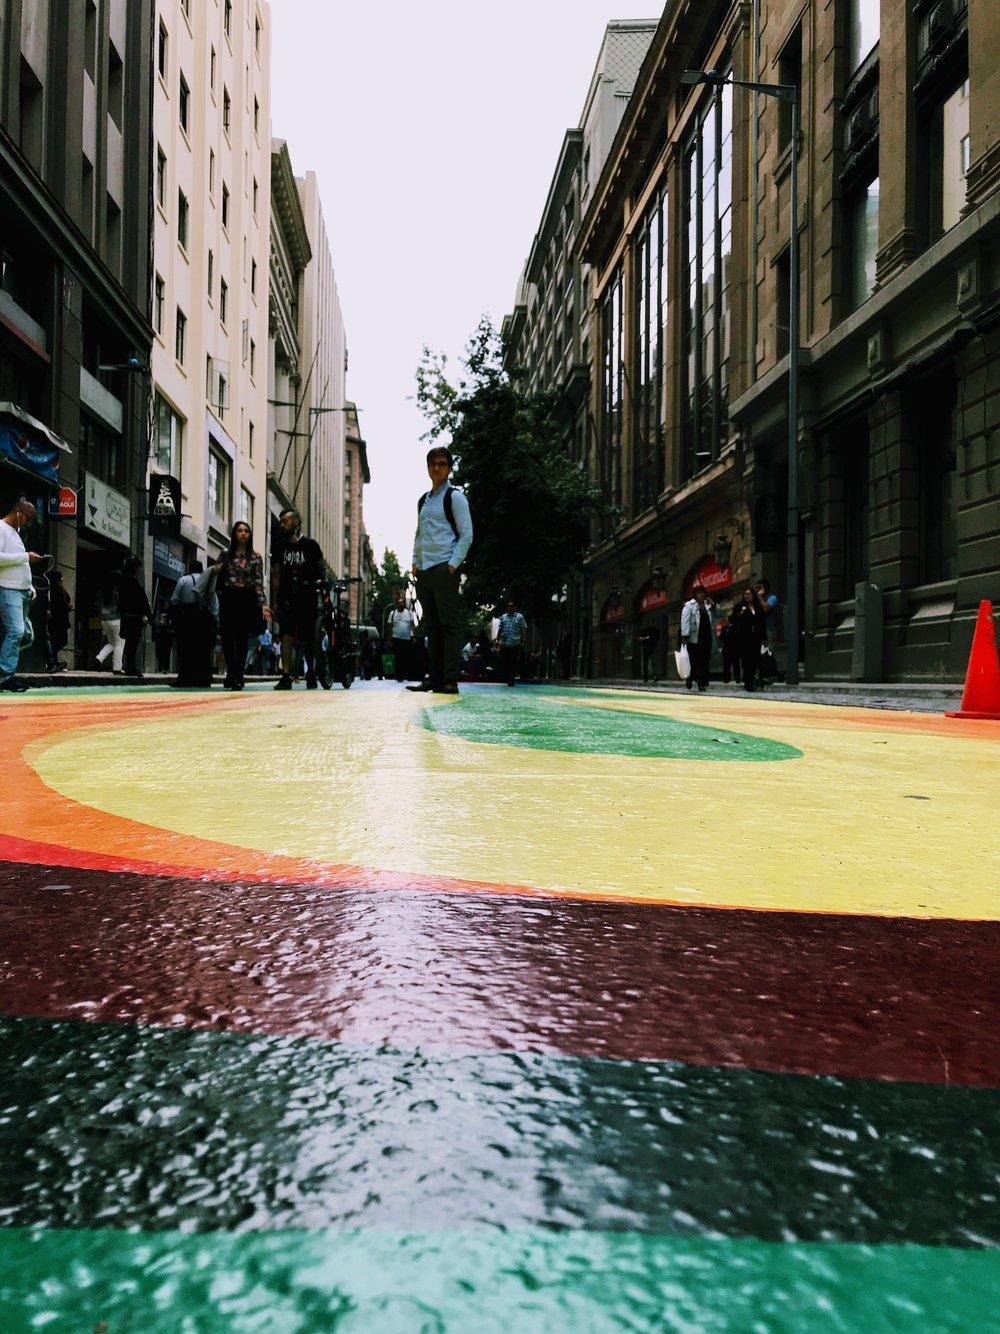 Bandera street in Santiago Chile